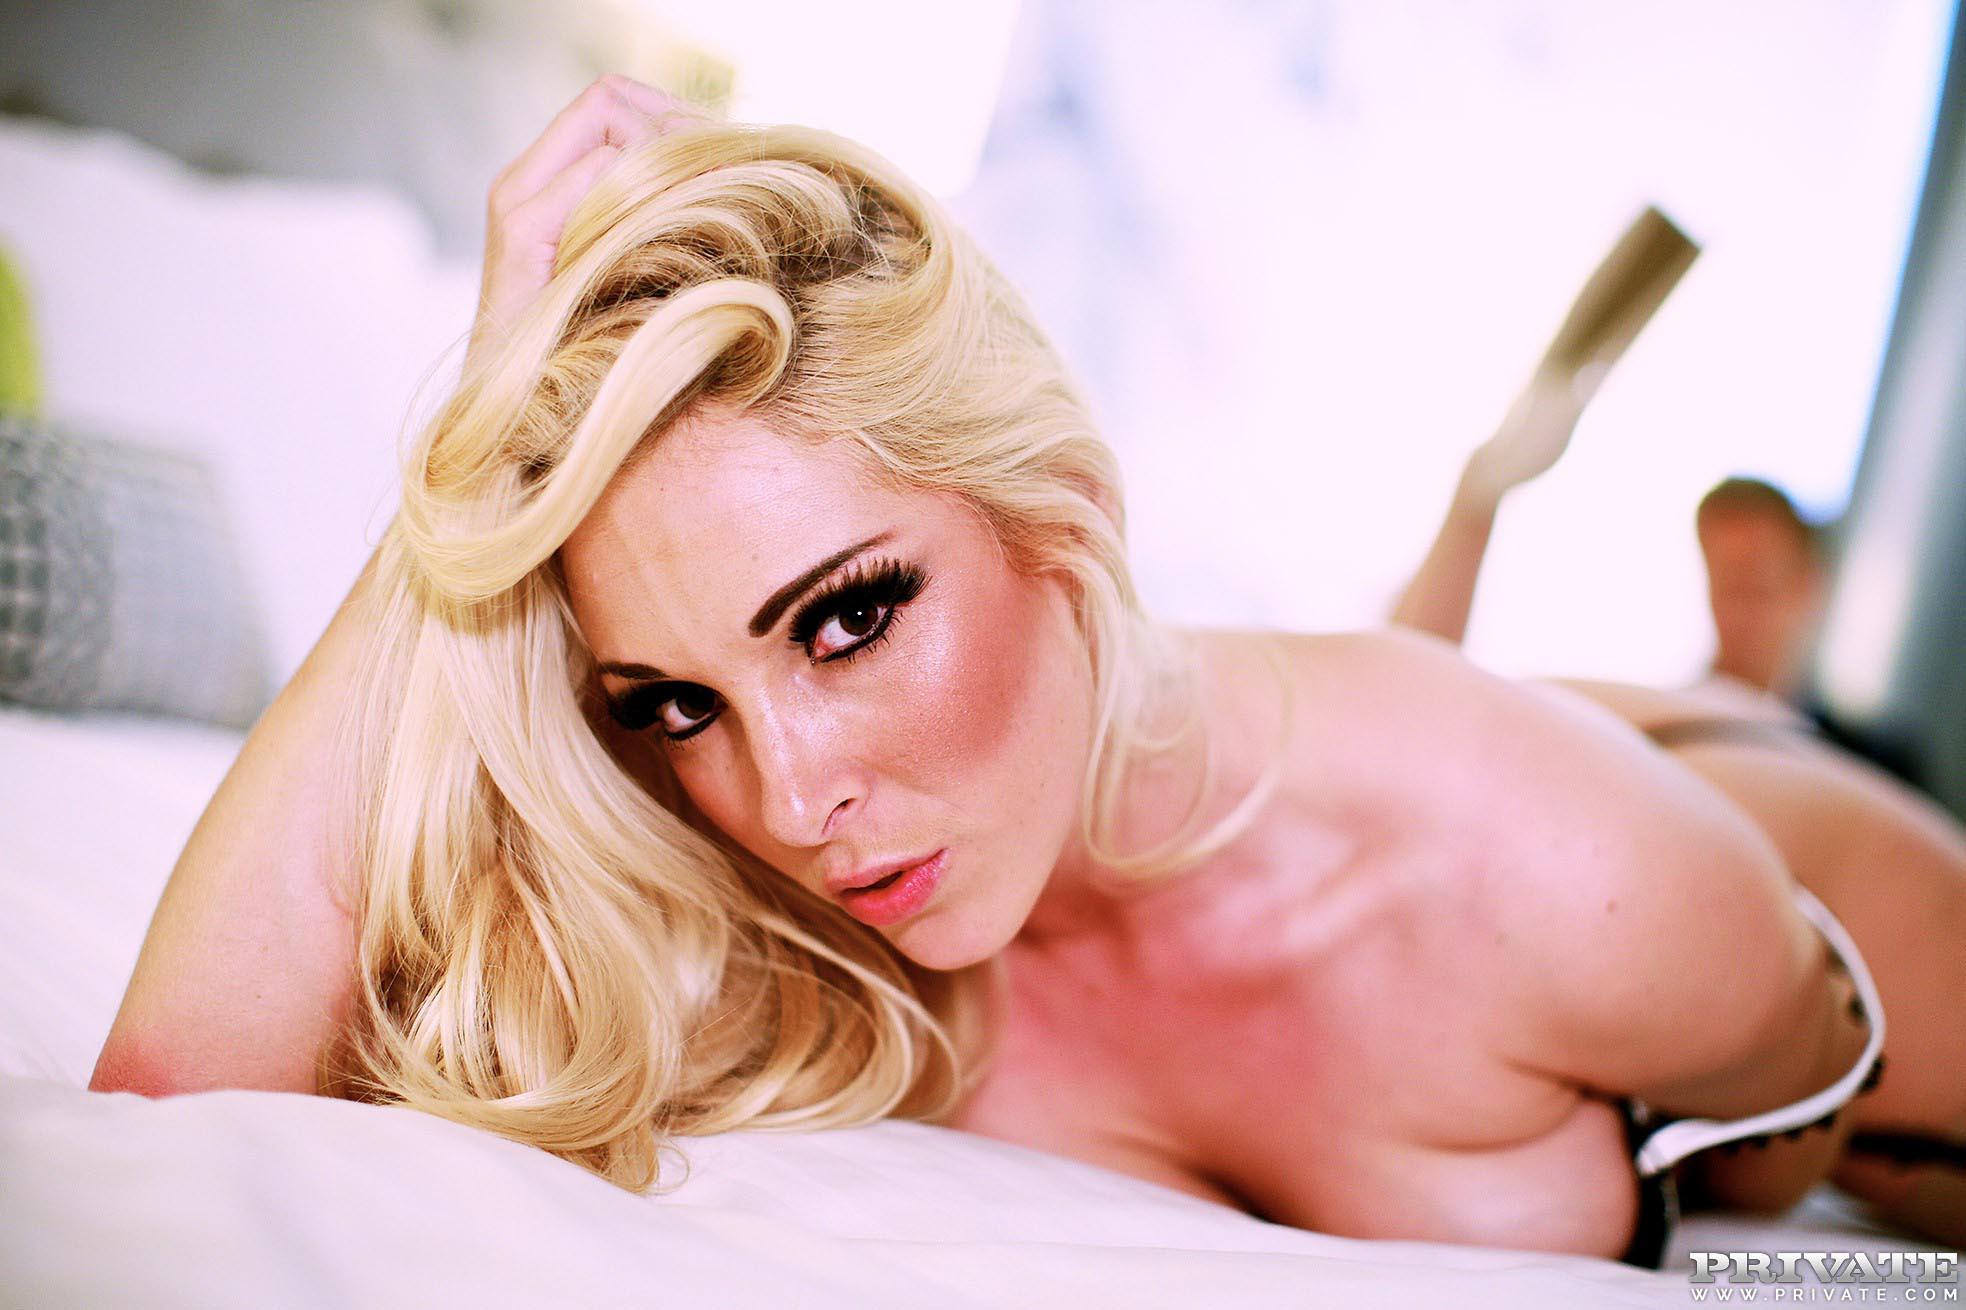 photo 2 of 12 victoria summers, busty blonde slut fucking wi